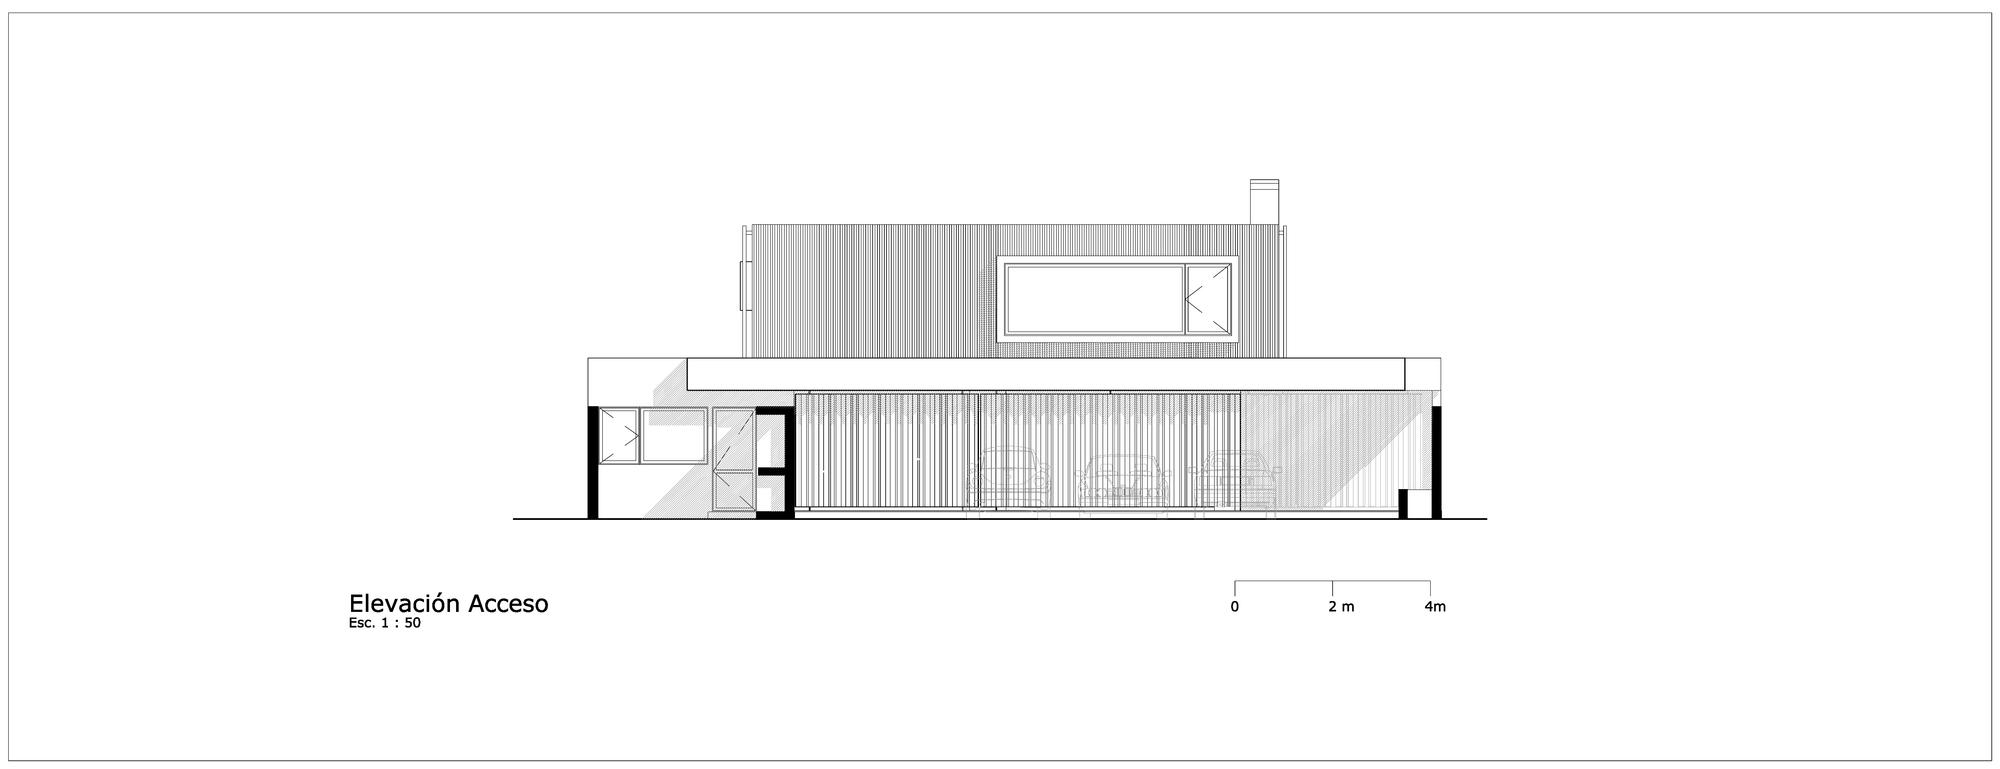 Galer a de casa m laga prietoschaffer arquitectos 18 - Arquitectos interioristas malaga ...